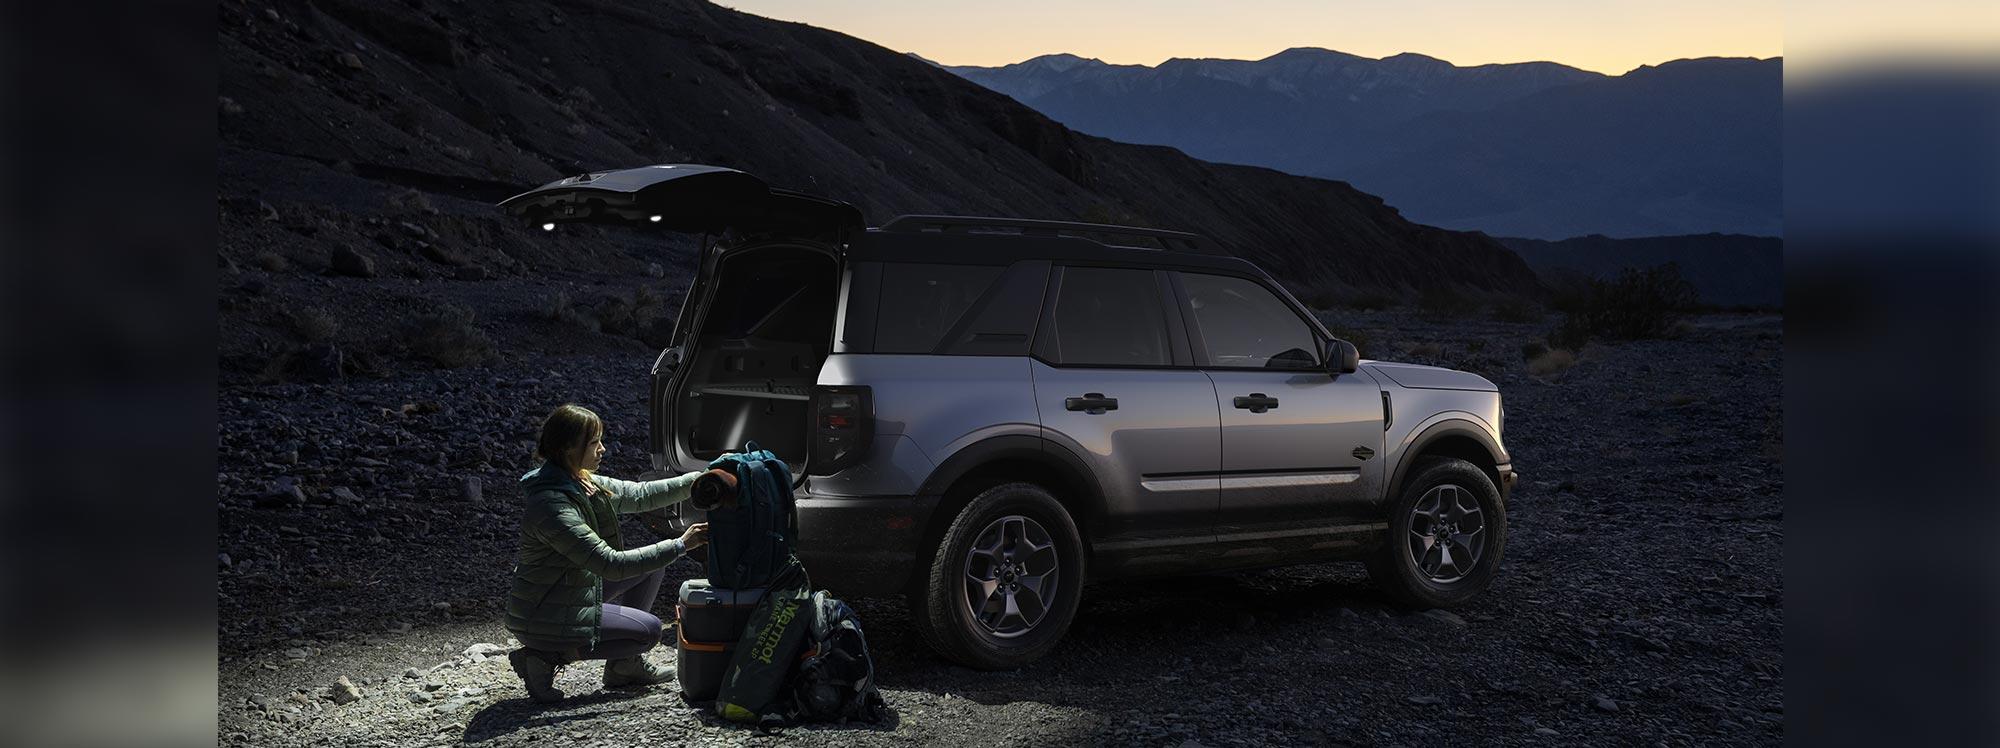 Una Ford que nació para la aventura